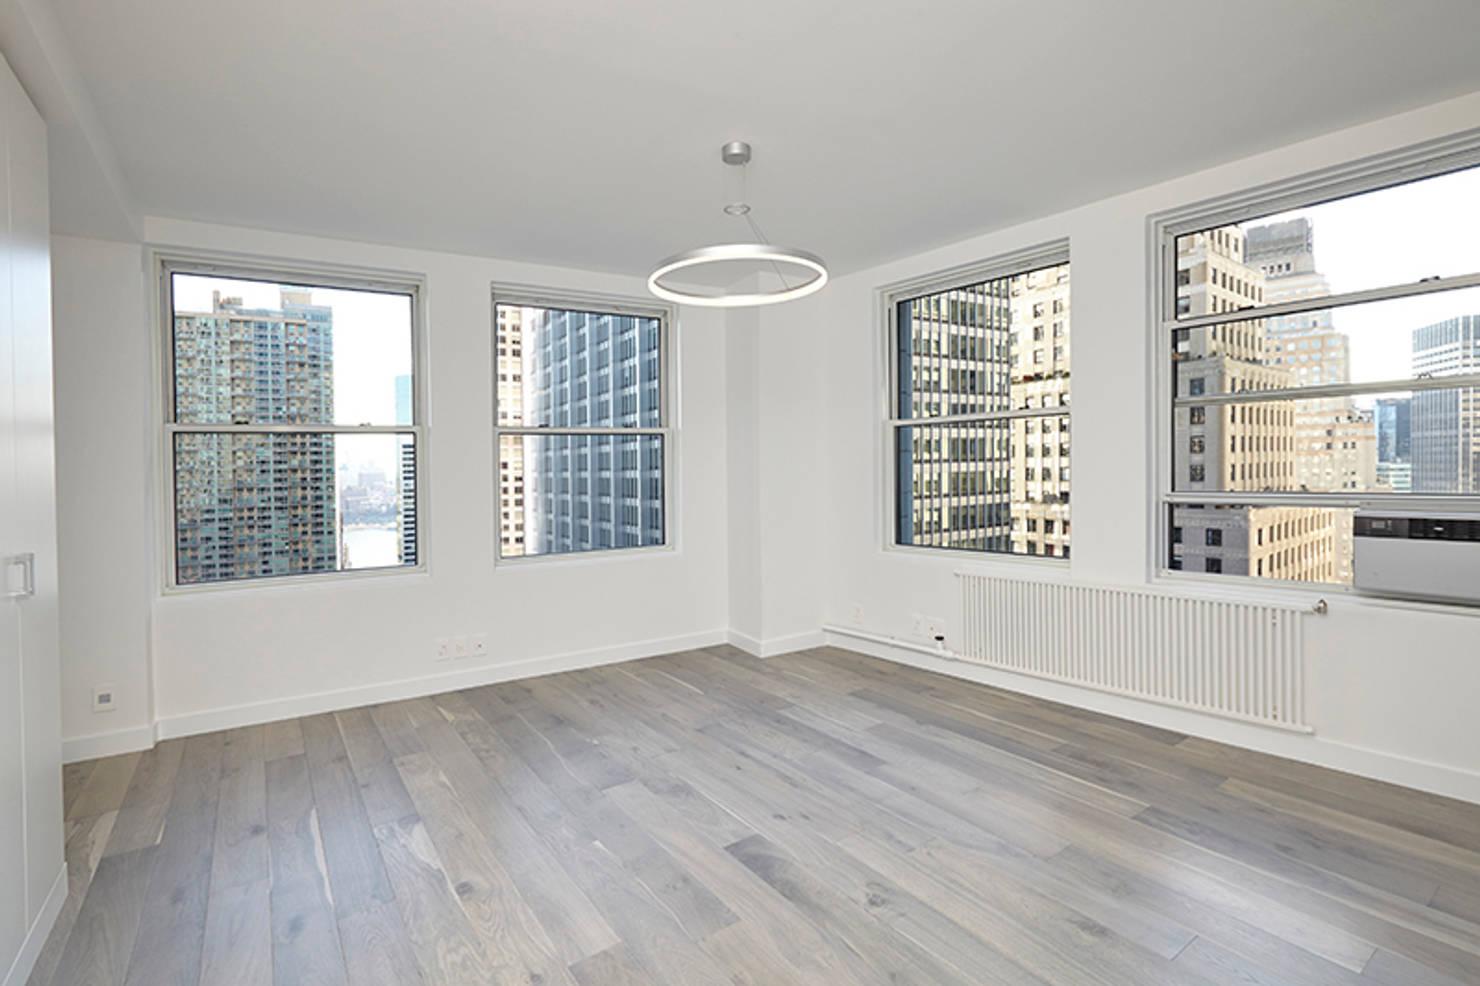 A breathtaking all-white apartment